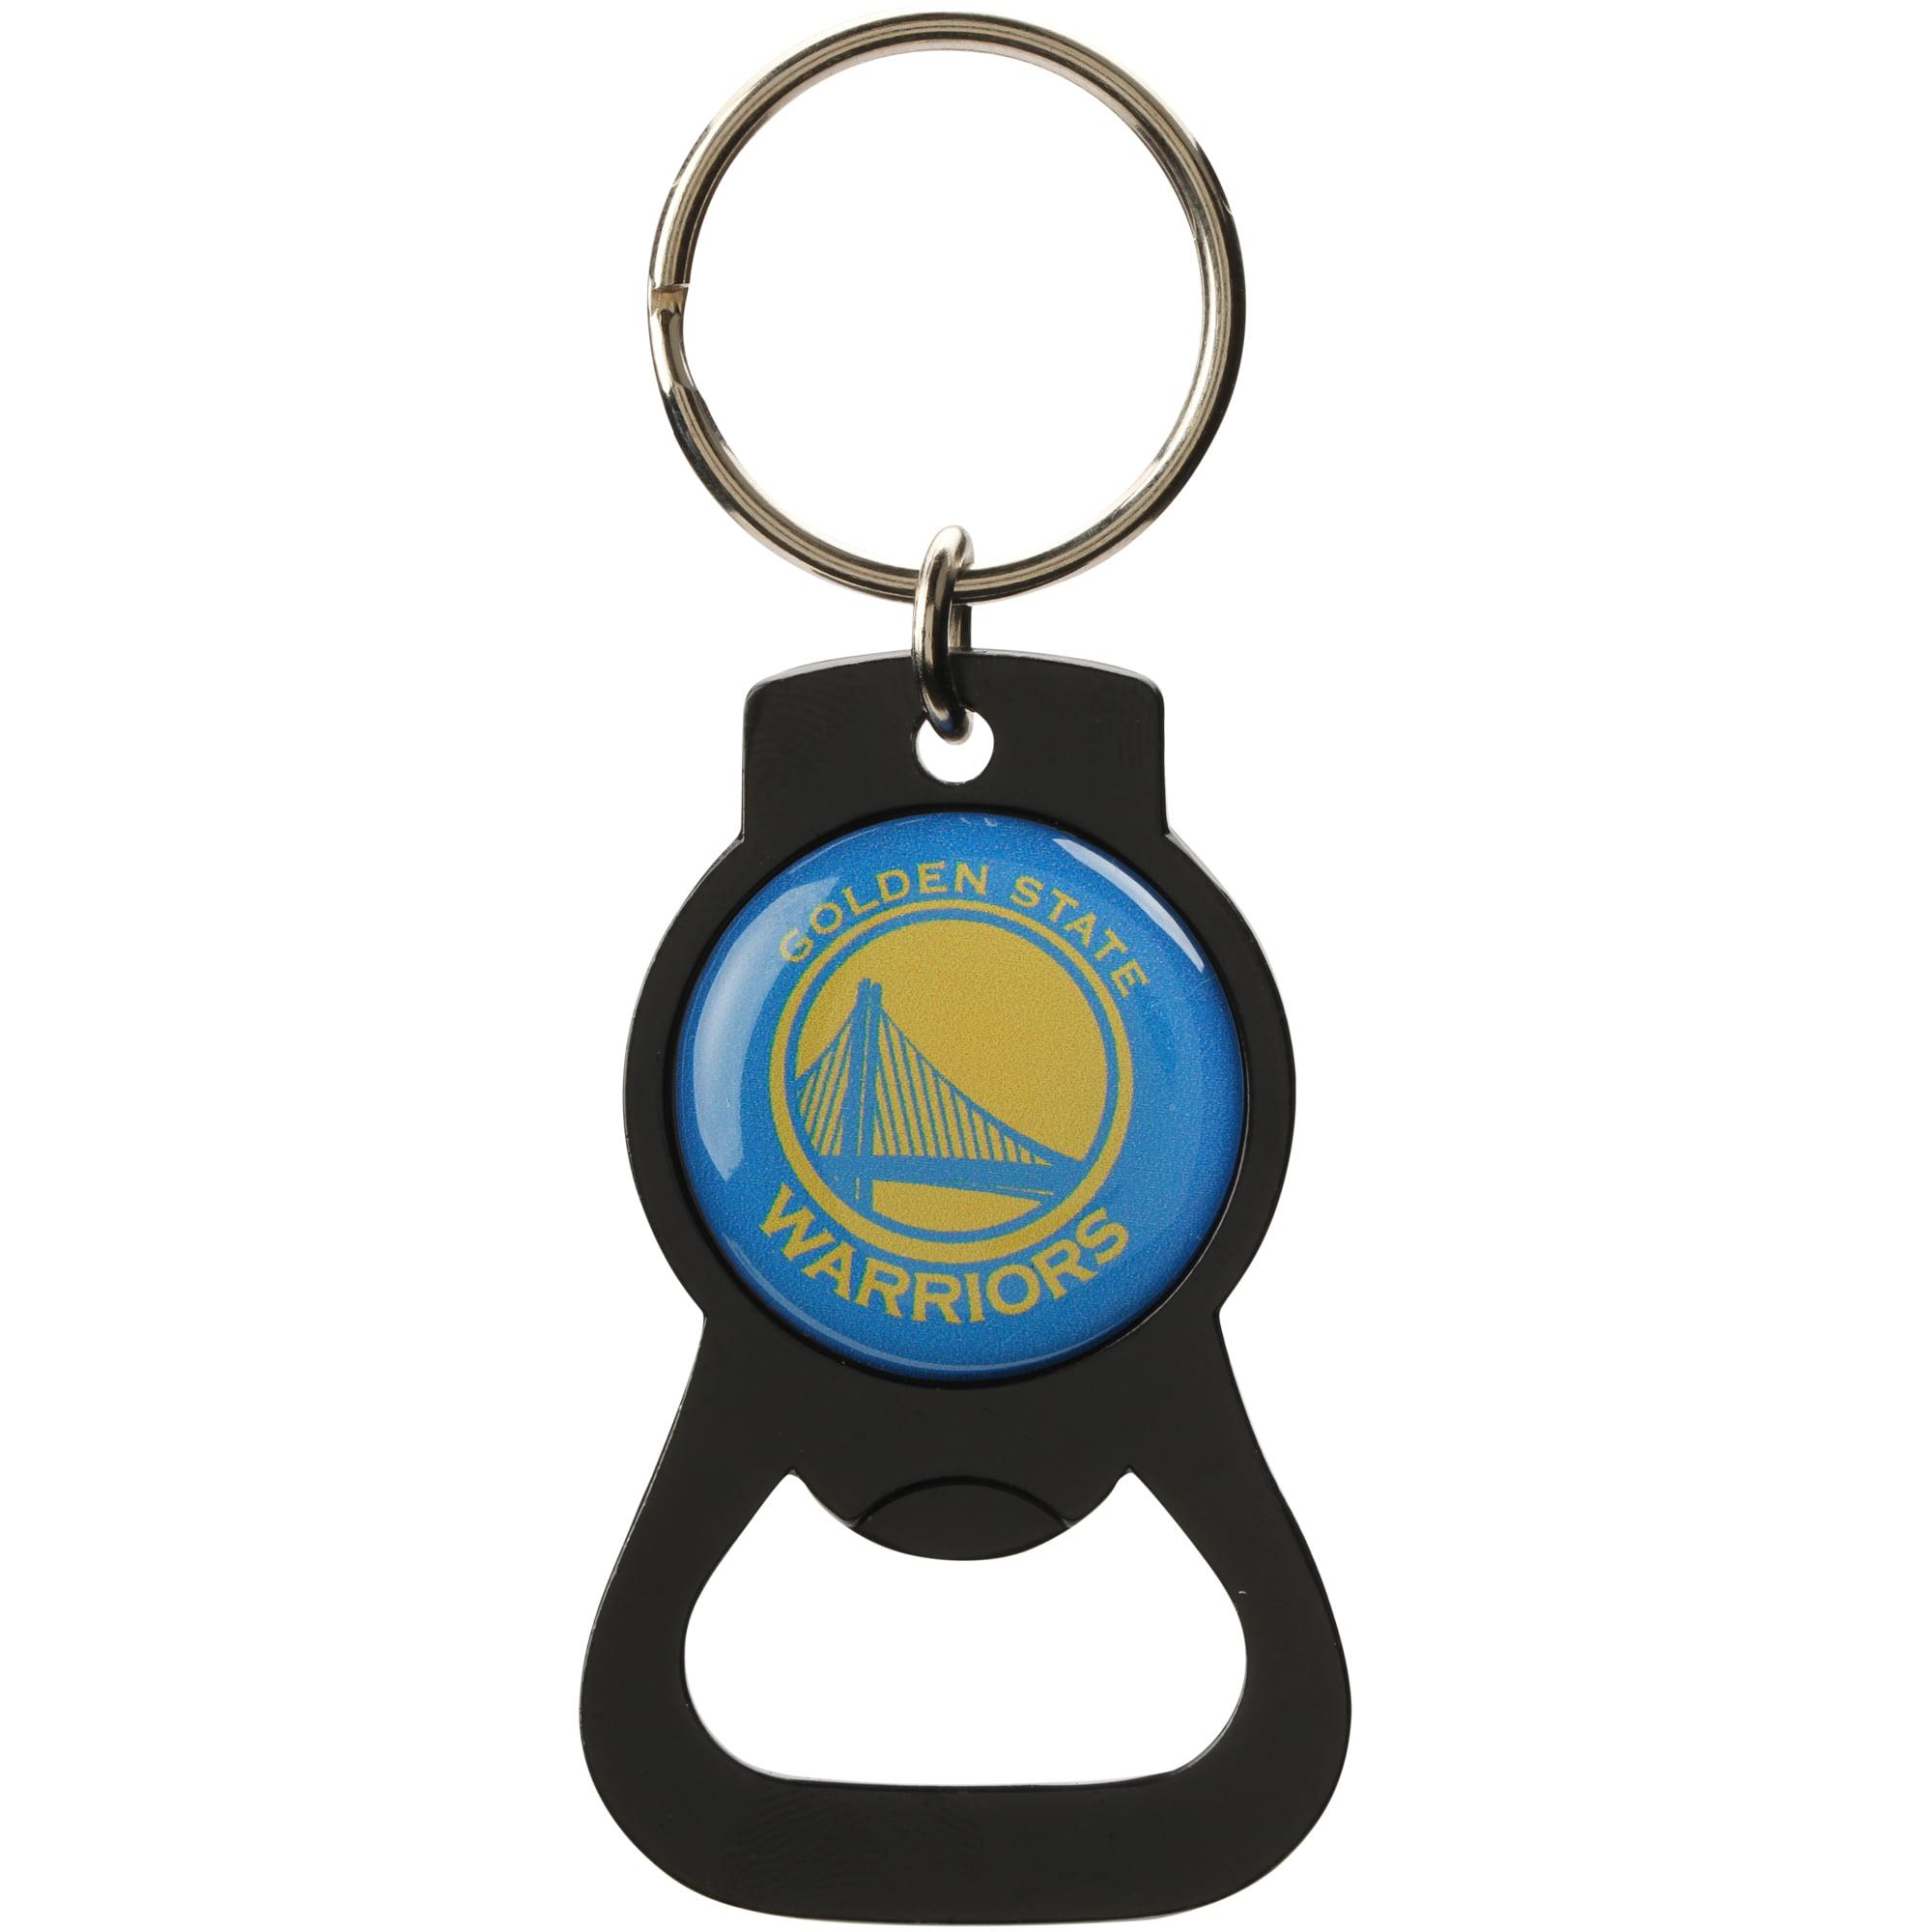 Golden State Warriors Bottle Opener Keychain - Black - No Size